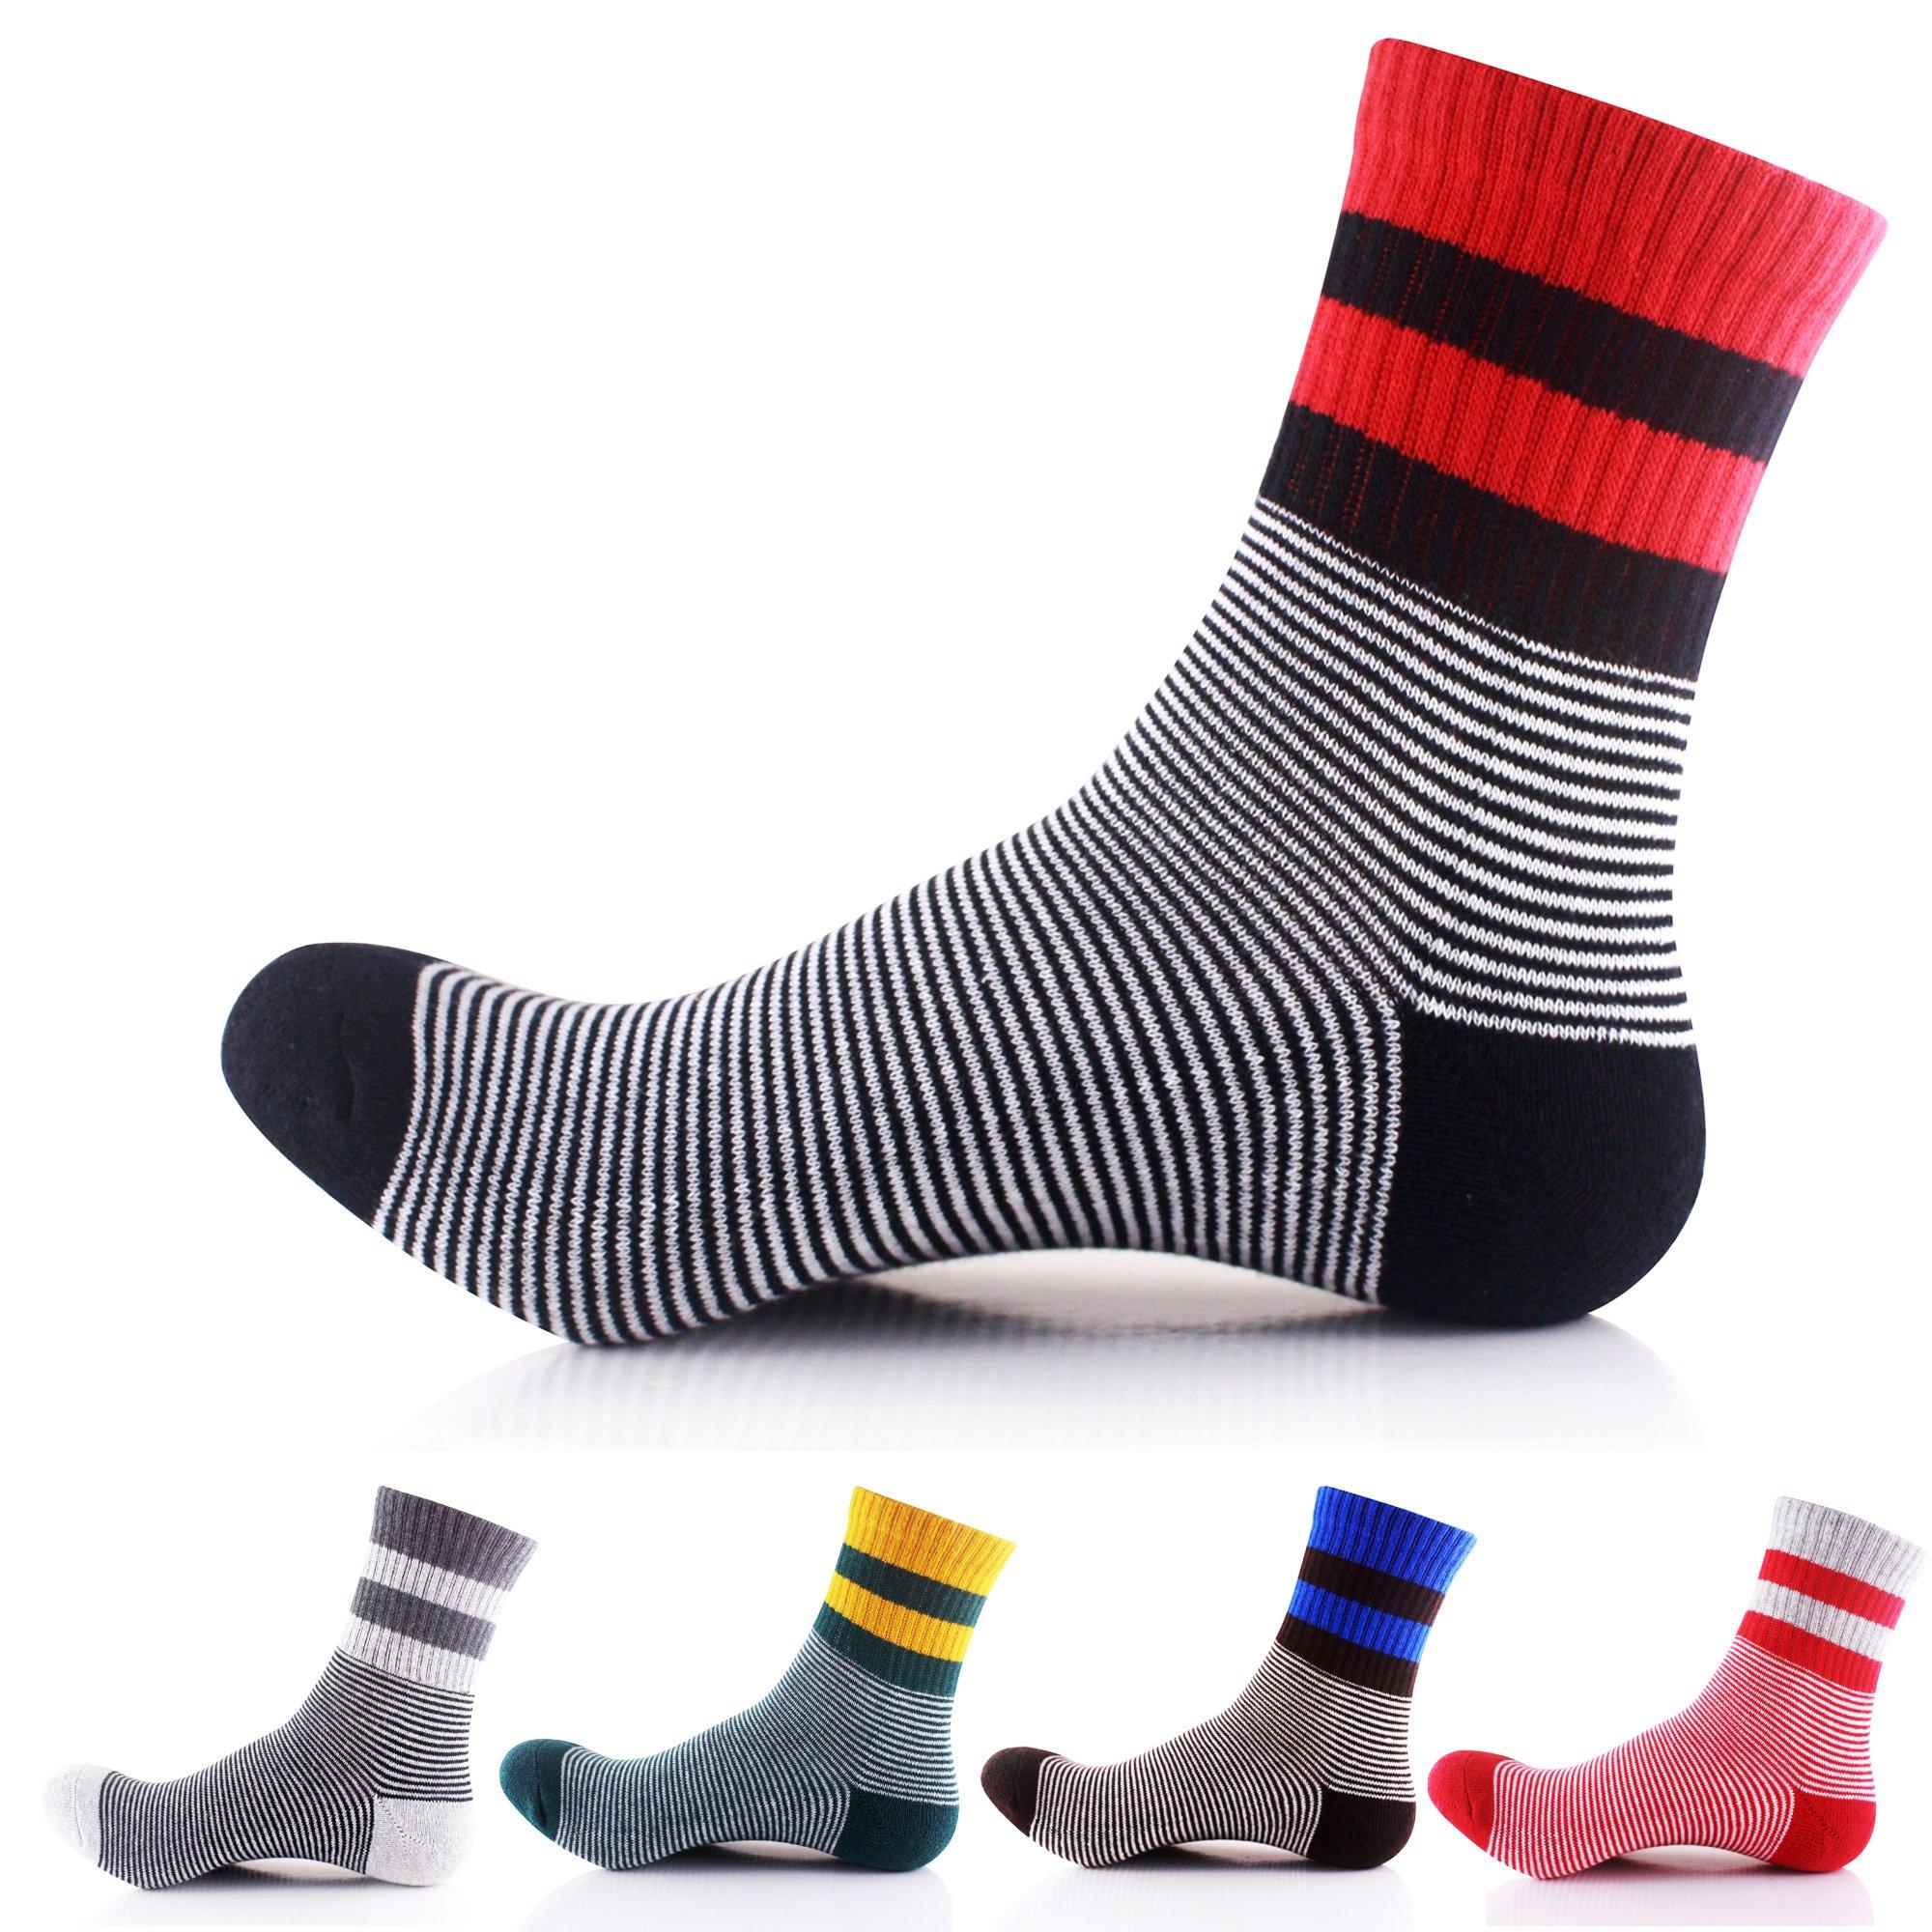 Men's Cotton Quarter Athletic Sock 5 Pairs(Assorted Color)